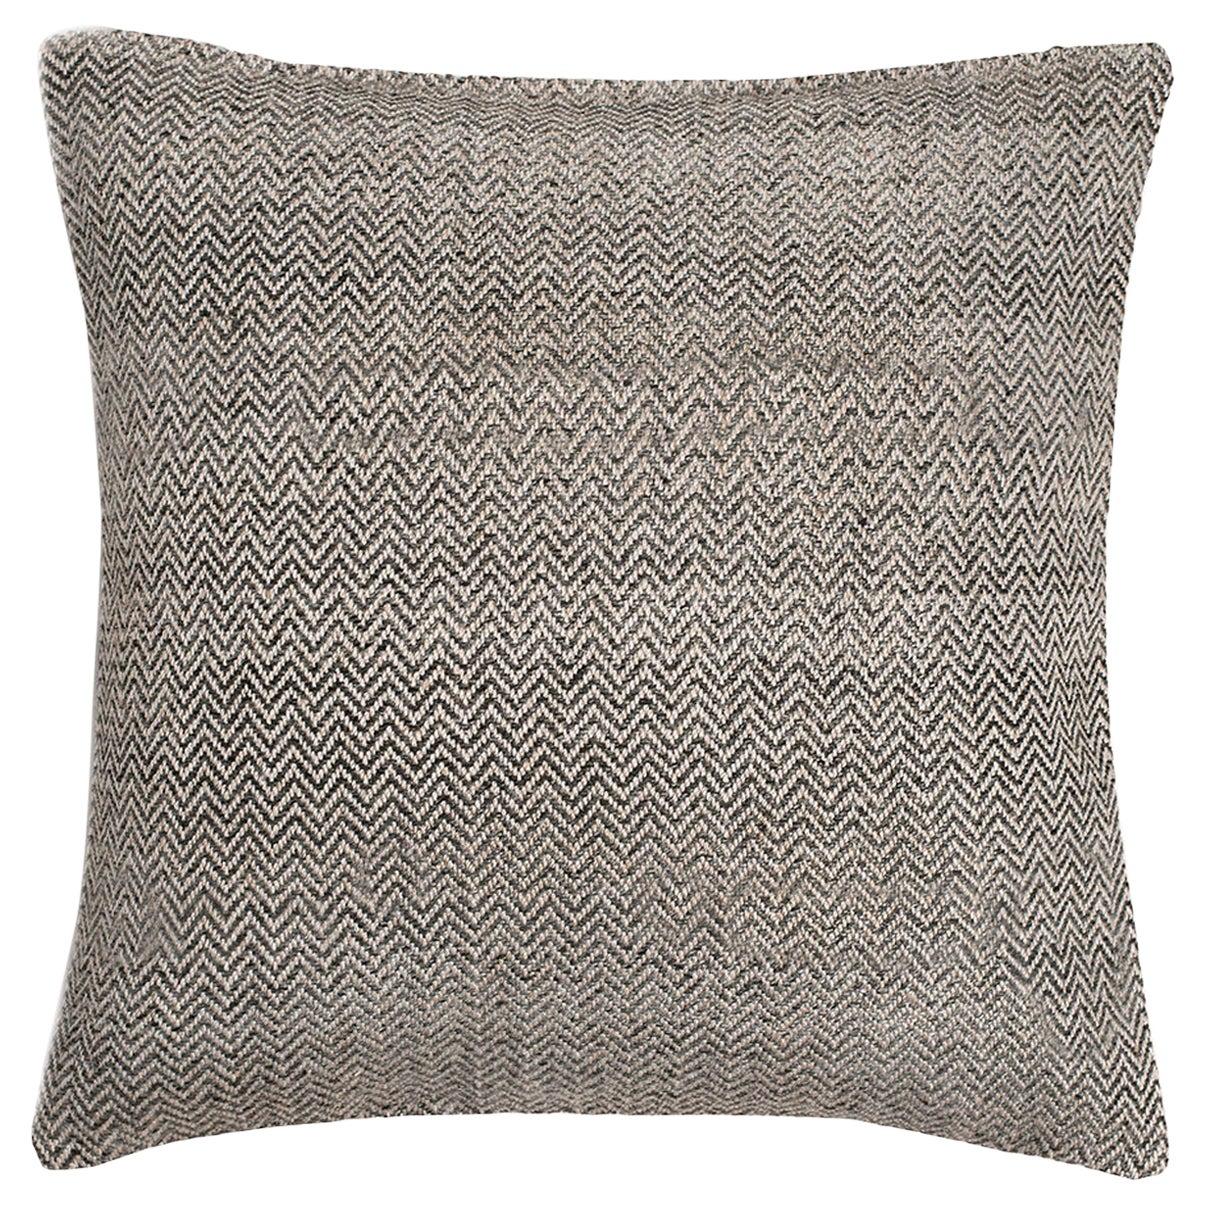 "Ben Soleimani Chevron Pillow - Graphite 26""x26"""